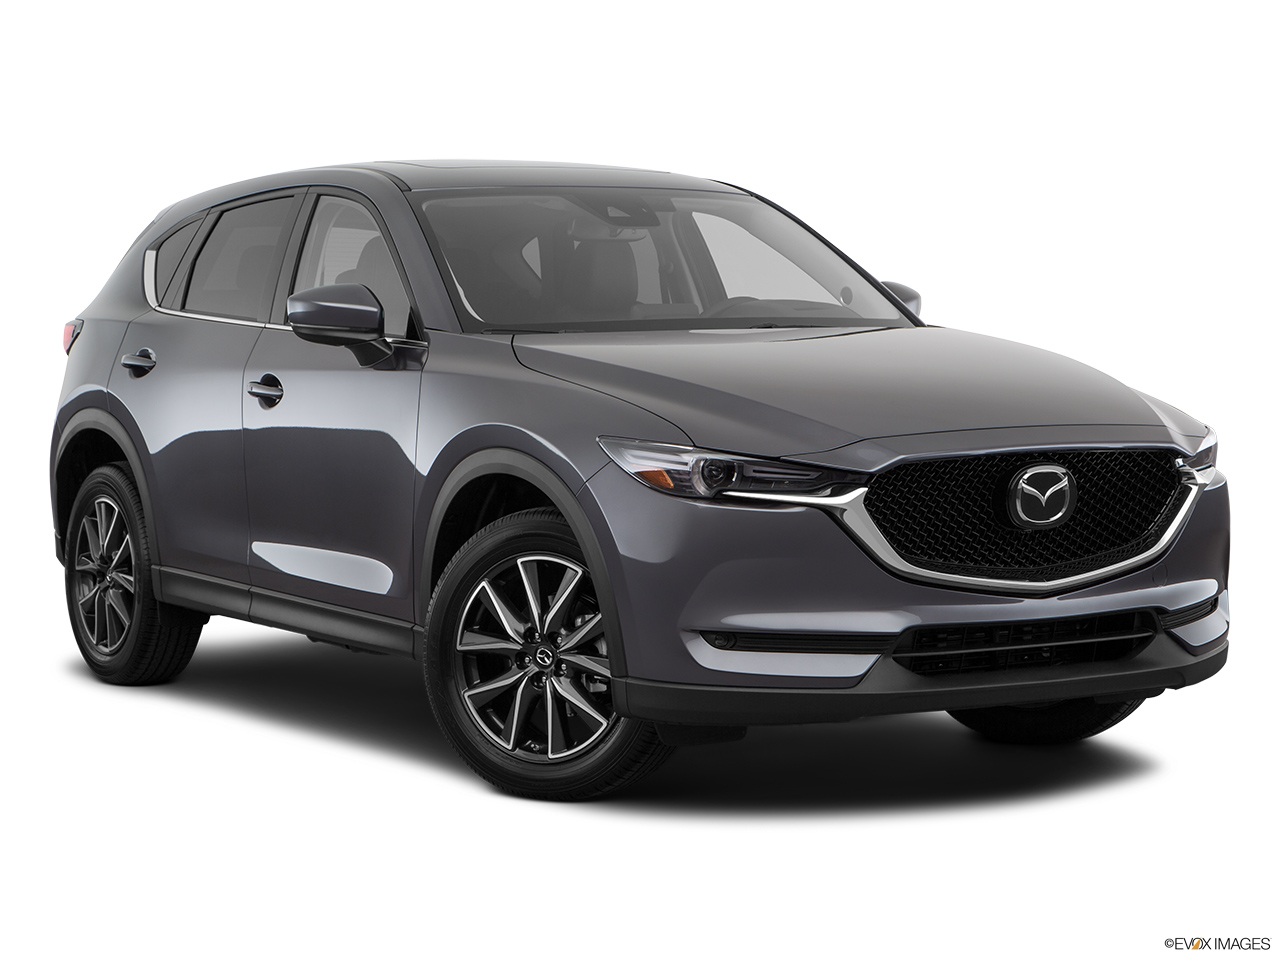 Kelebihan Mazda Zx5 Tangguh